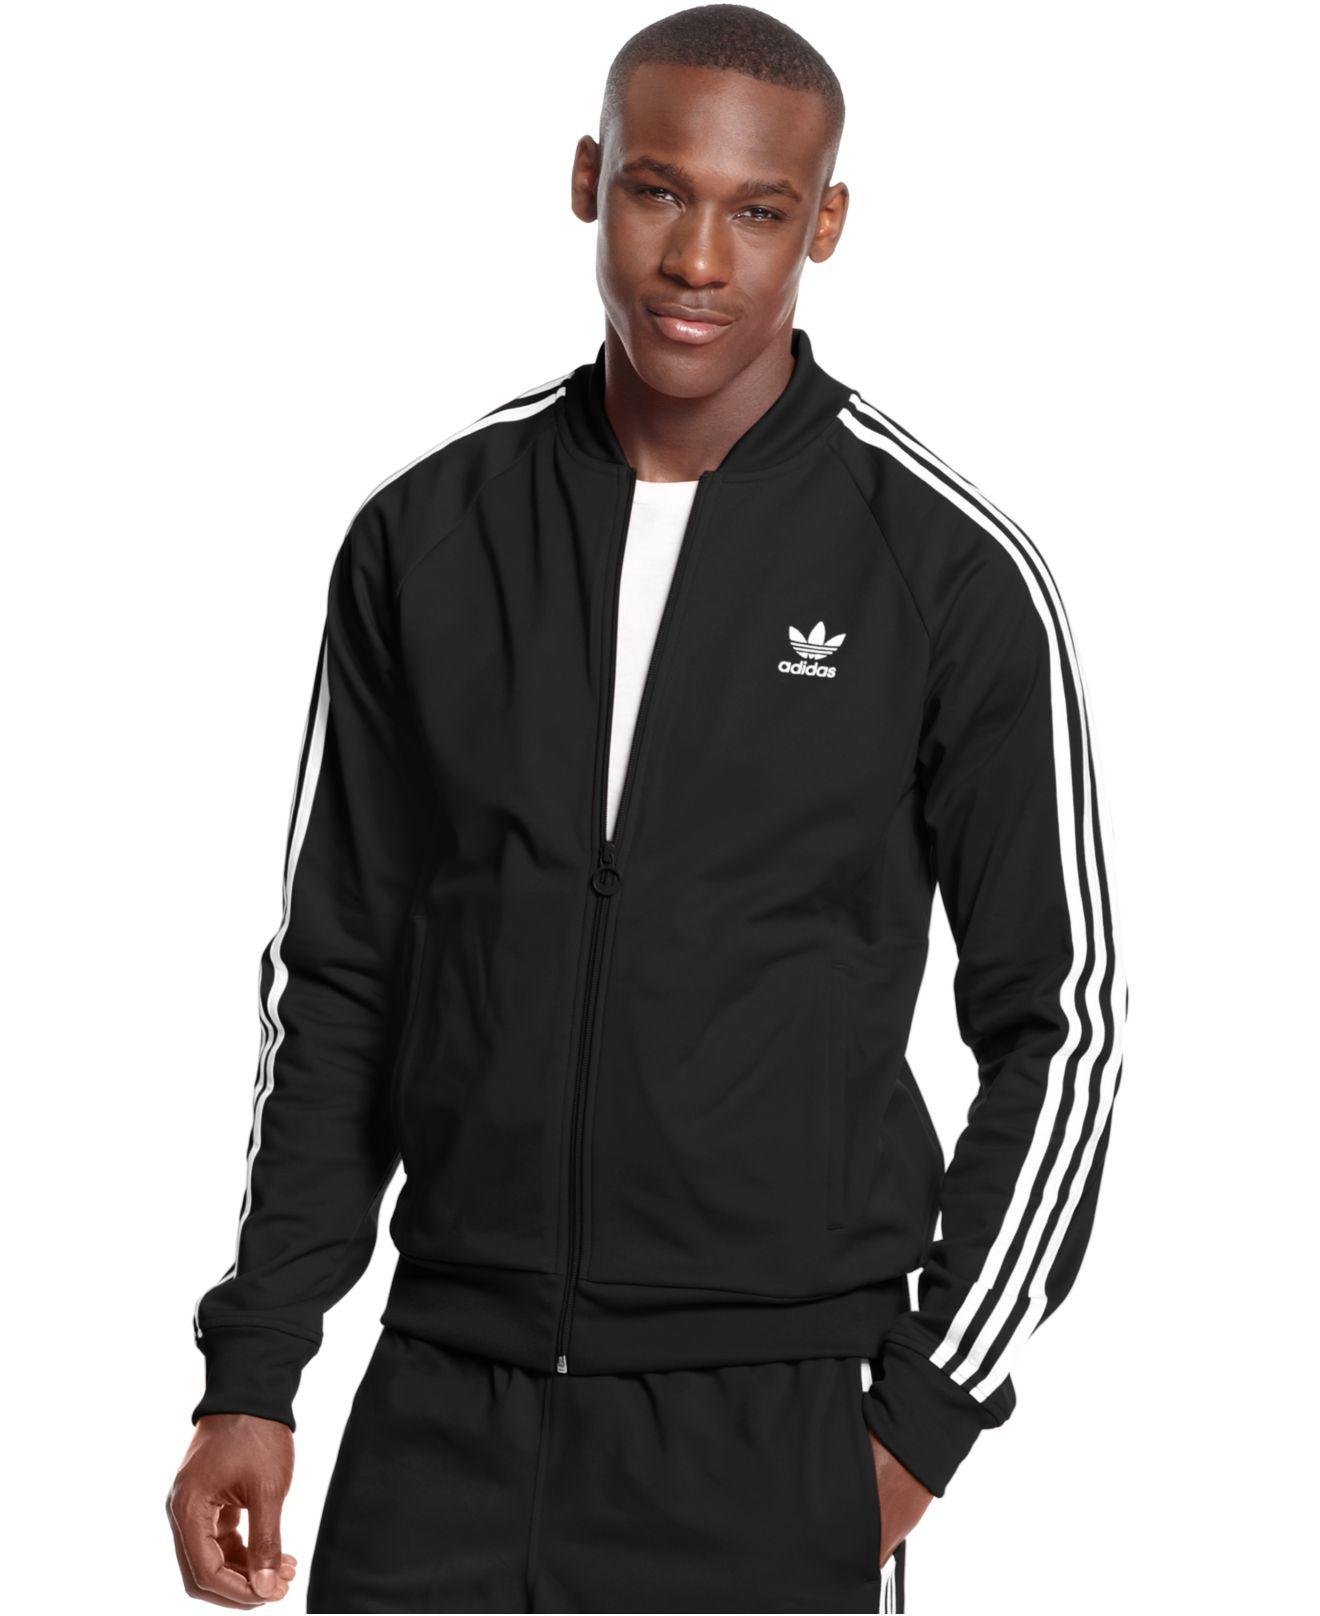 989547090116 Lyst - adidas Originals Superstar Track Jacket in Black for Men